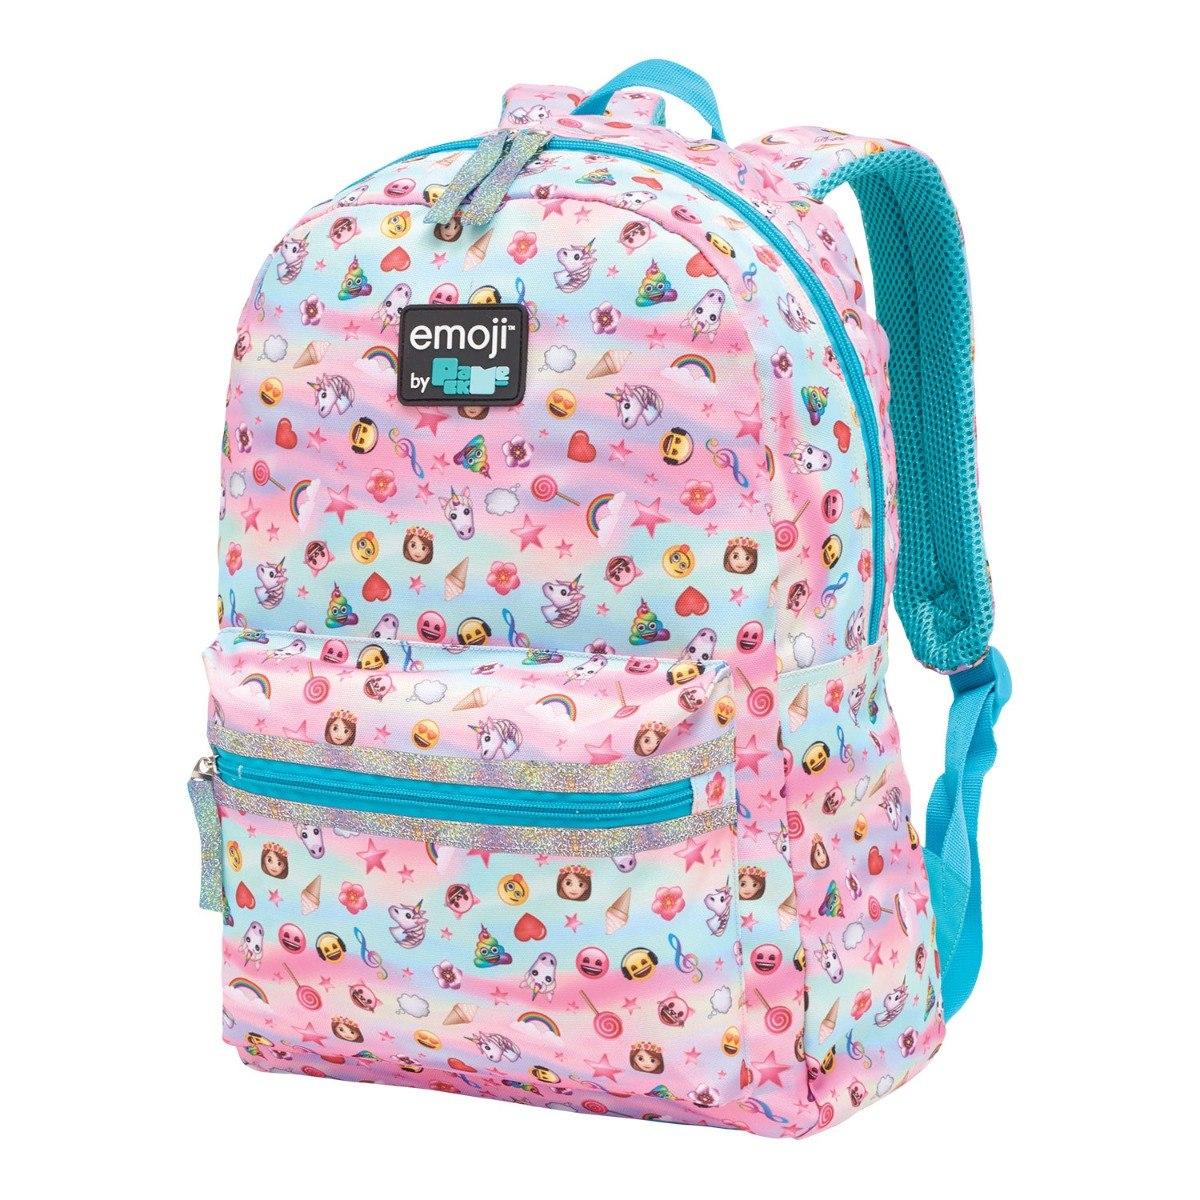 746a83ae5 mochila escolar costas emoji magical unicórnio pacific. Carregando zoom.